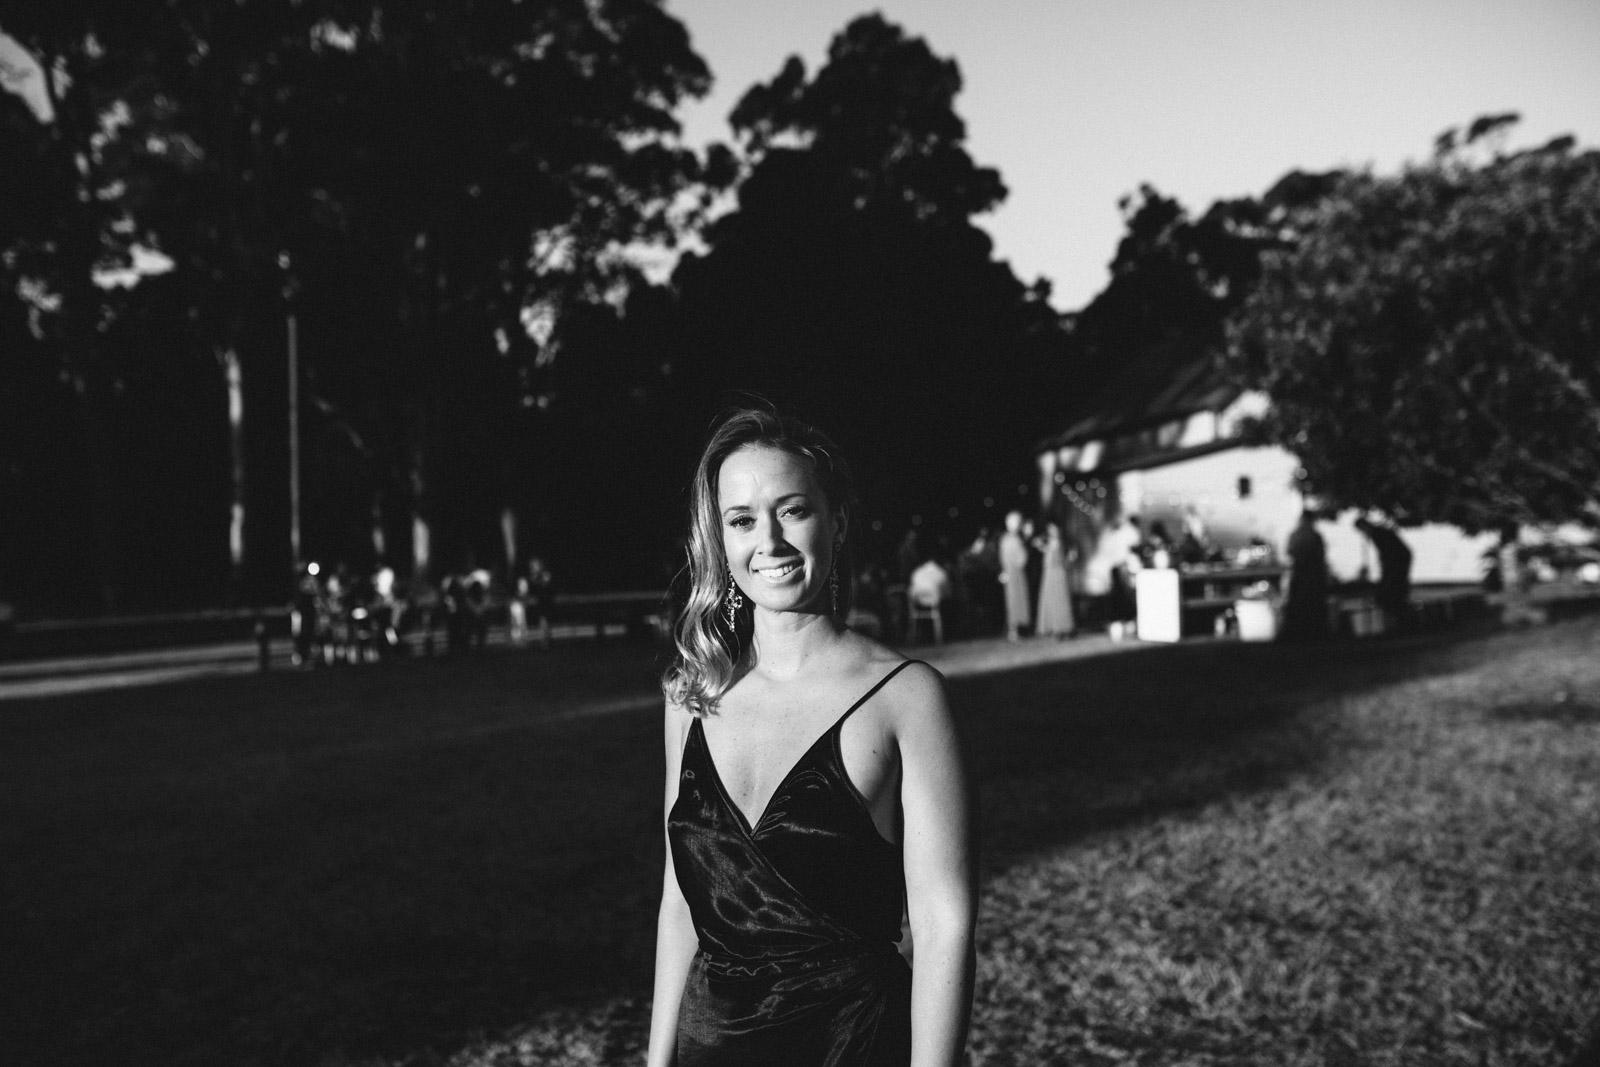 ZD-Melbourne Wedding Photographer-Dean Raphael-120.jpg